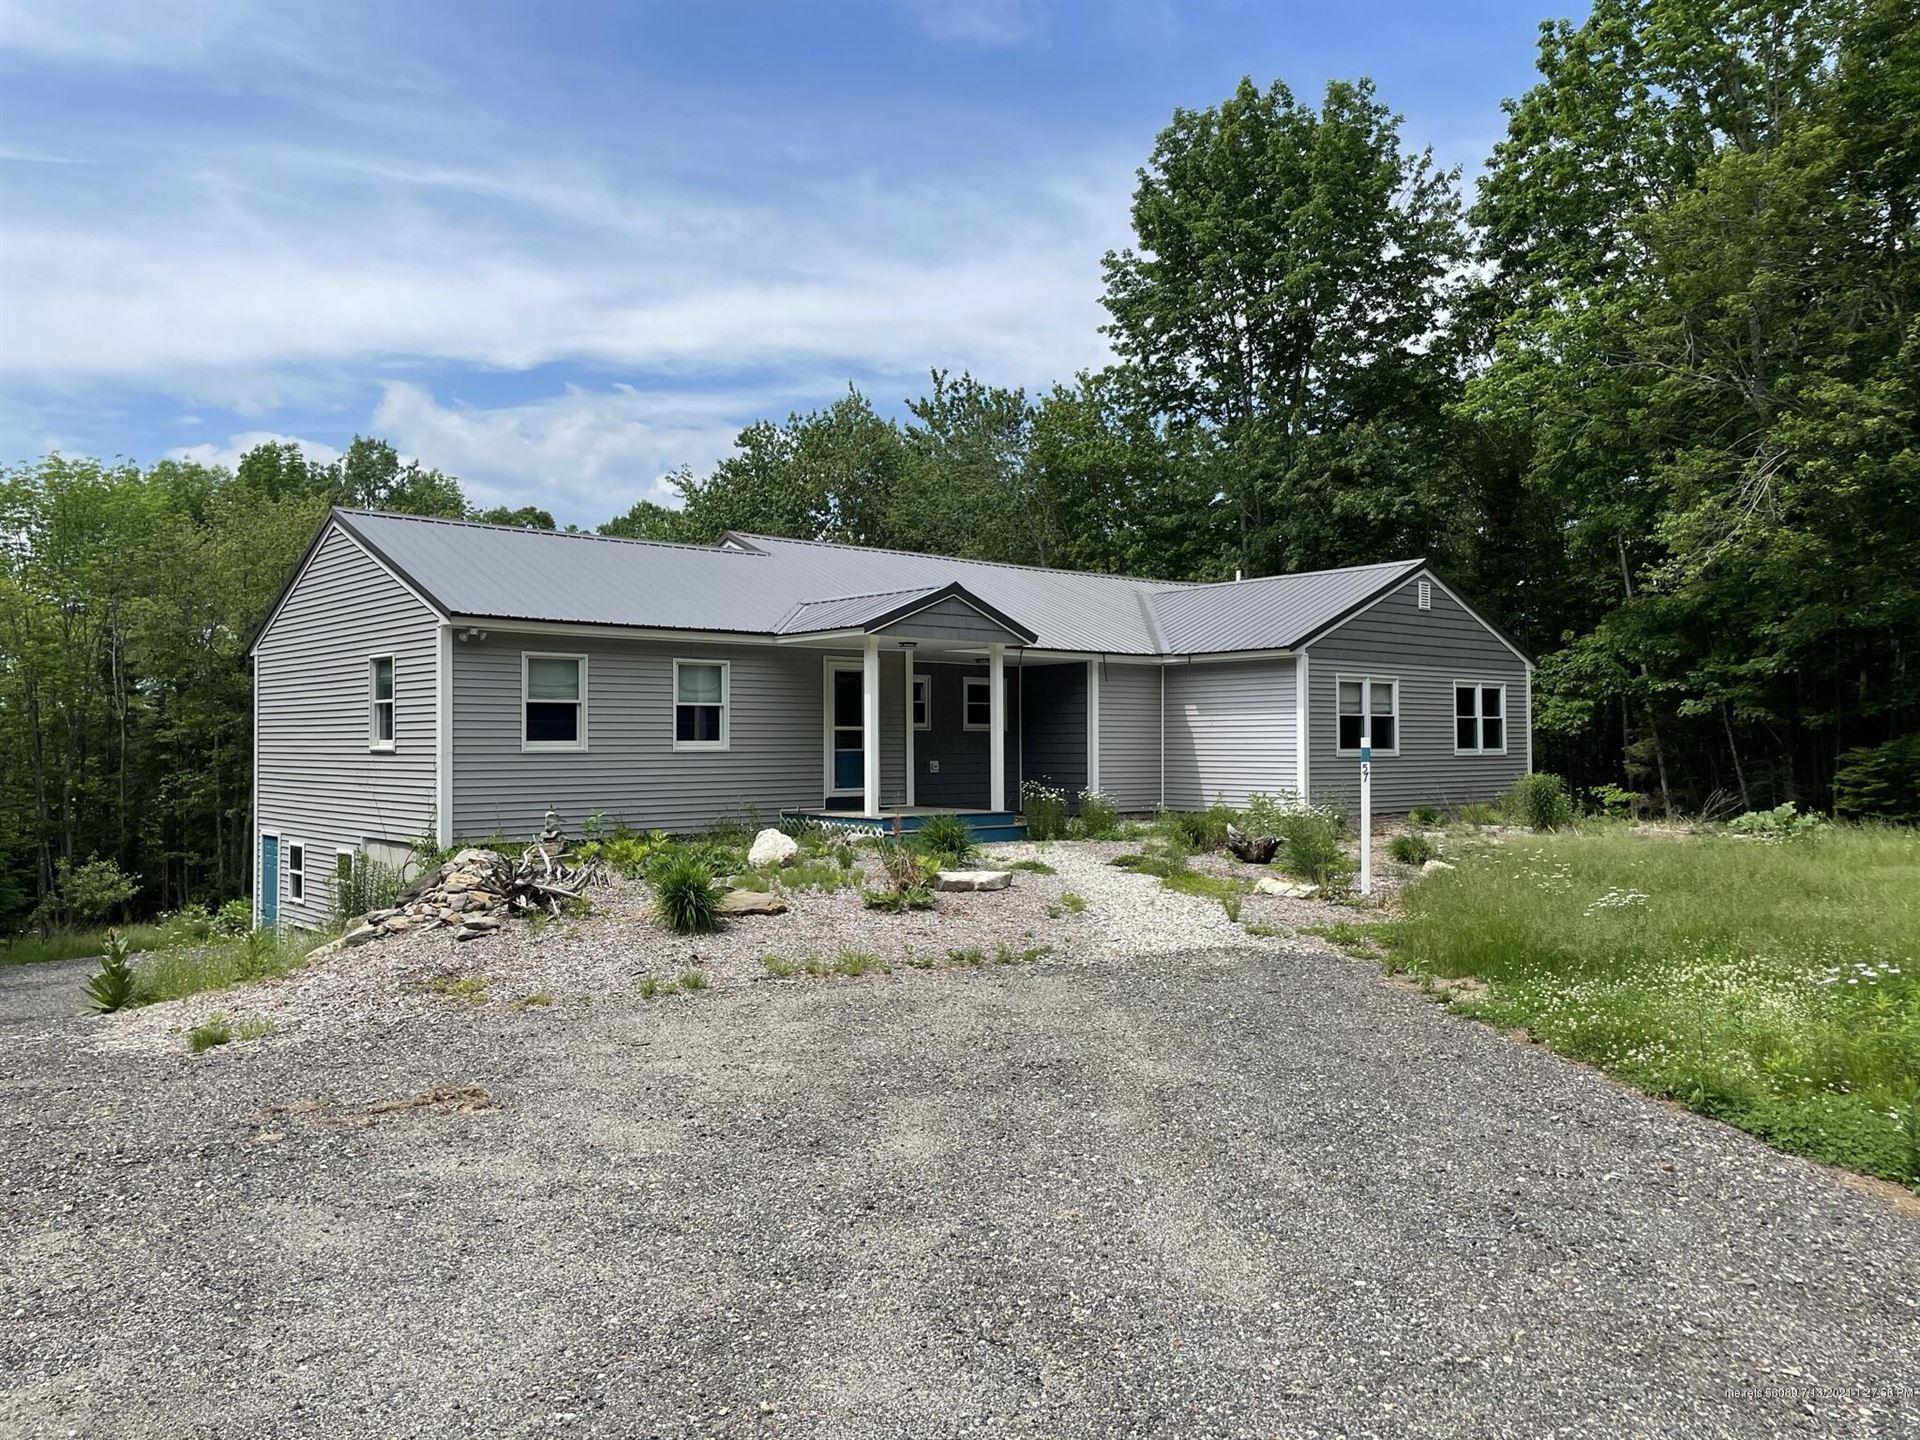 Photo of 57 Farmview Lane, Freeport, ME 04032 (MLS # 1495894)